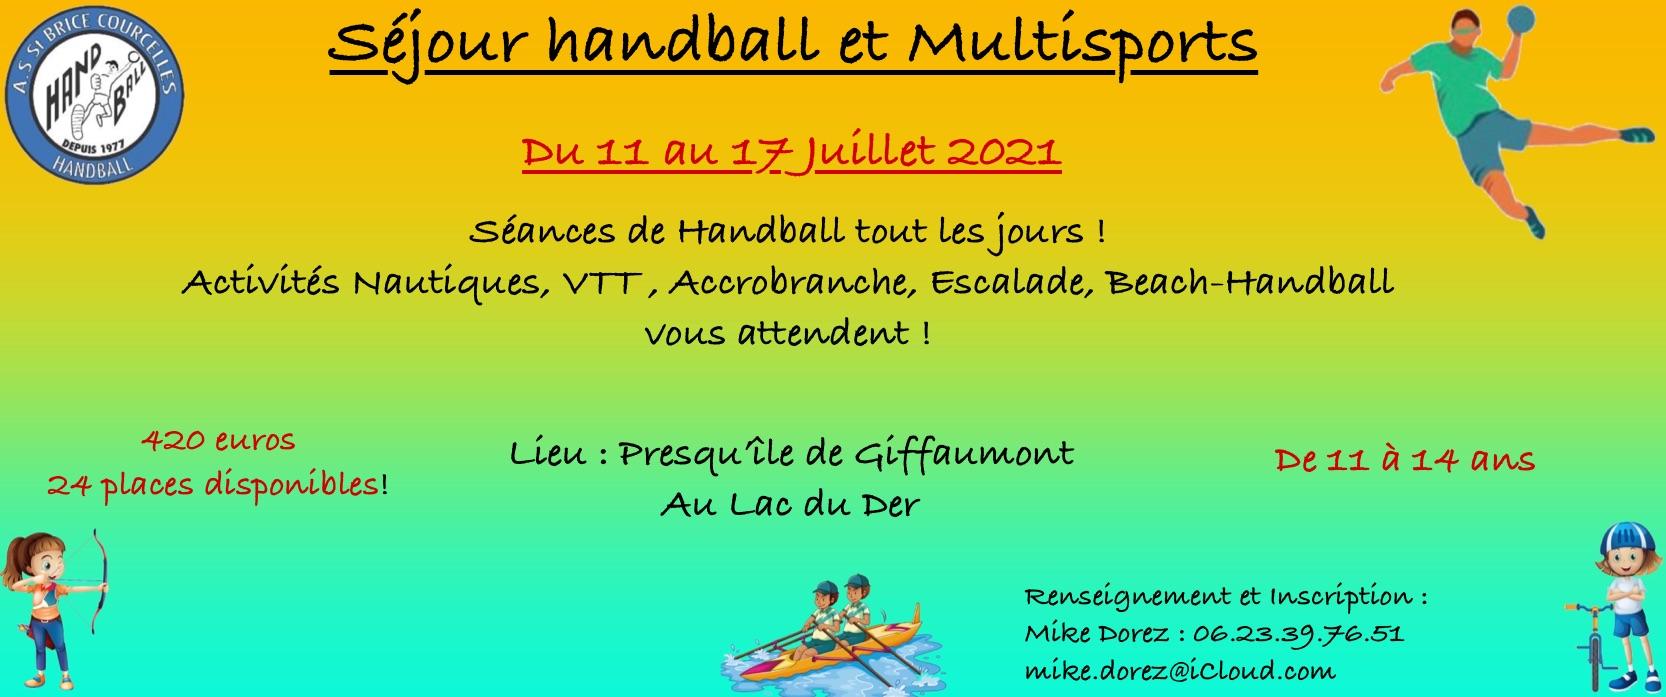 Séjour Handball et Multisports en juillet !